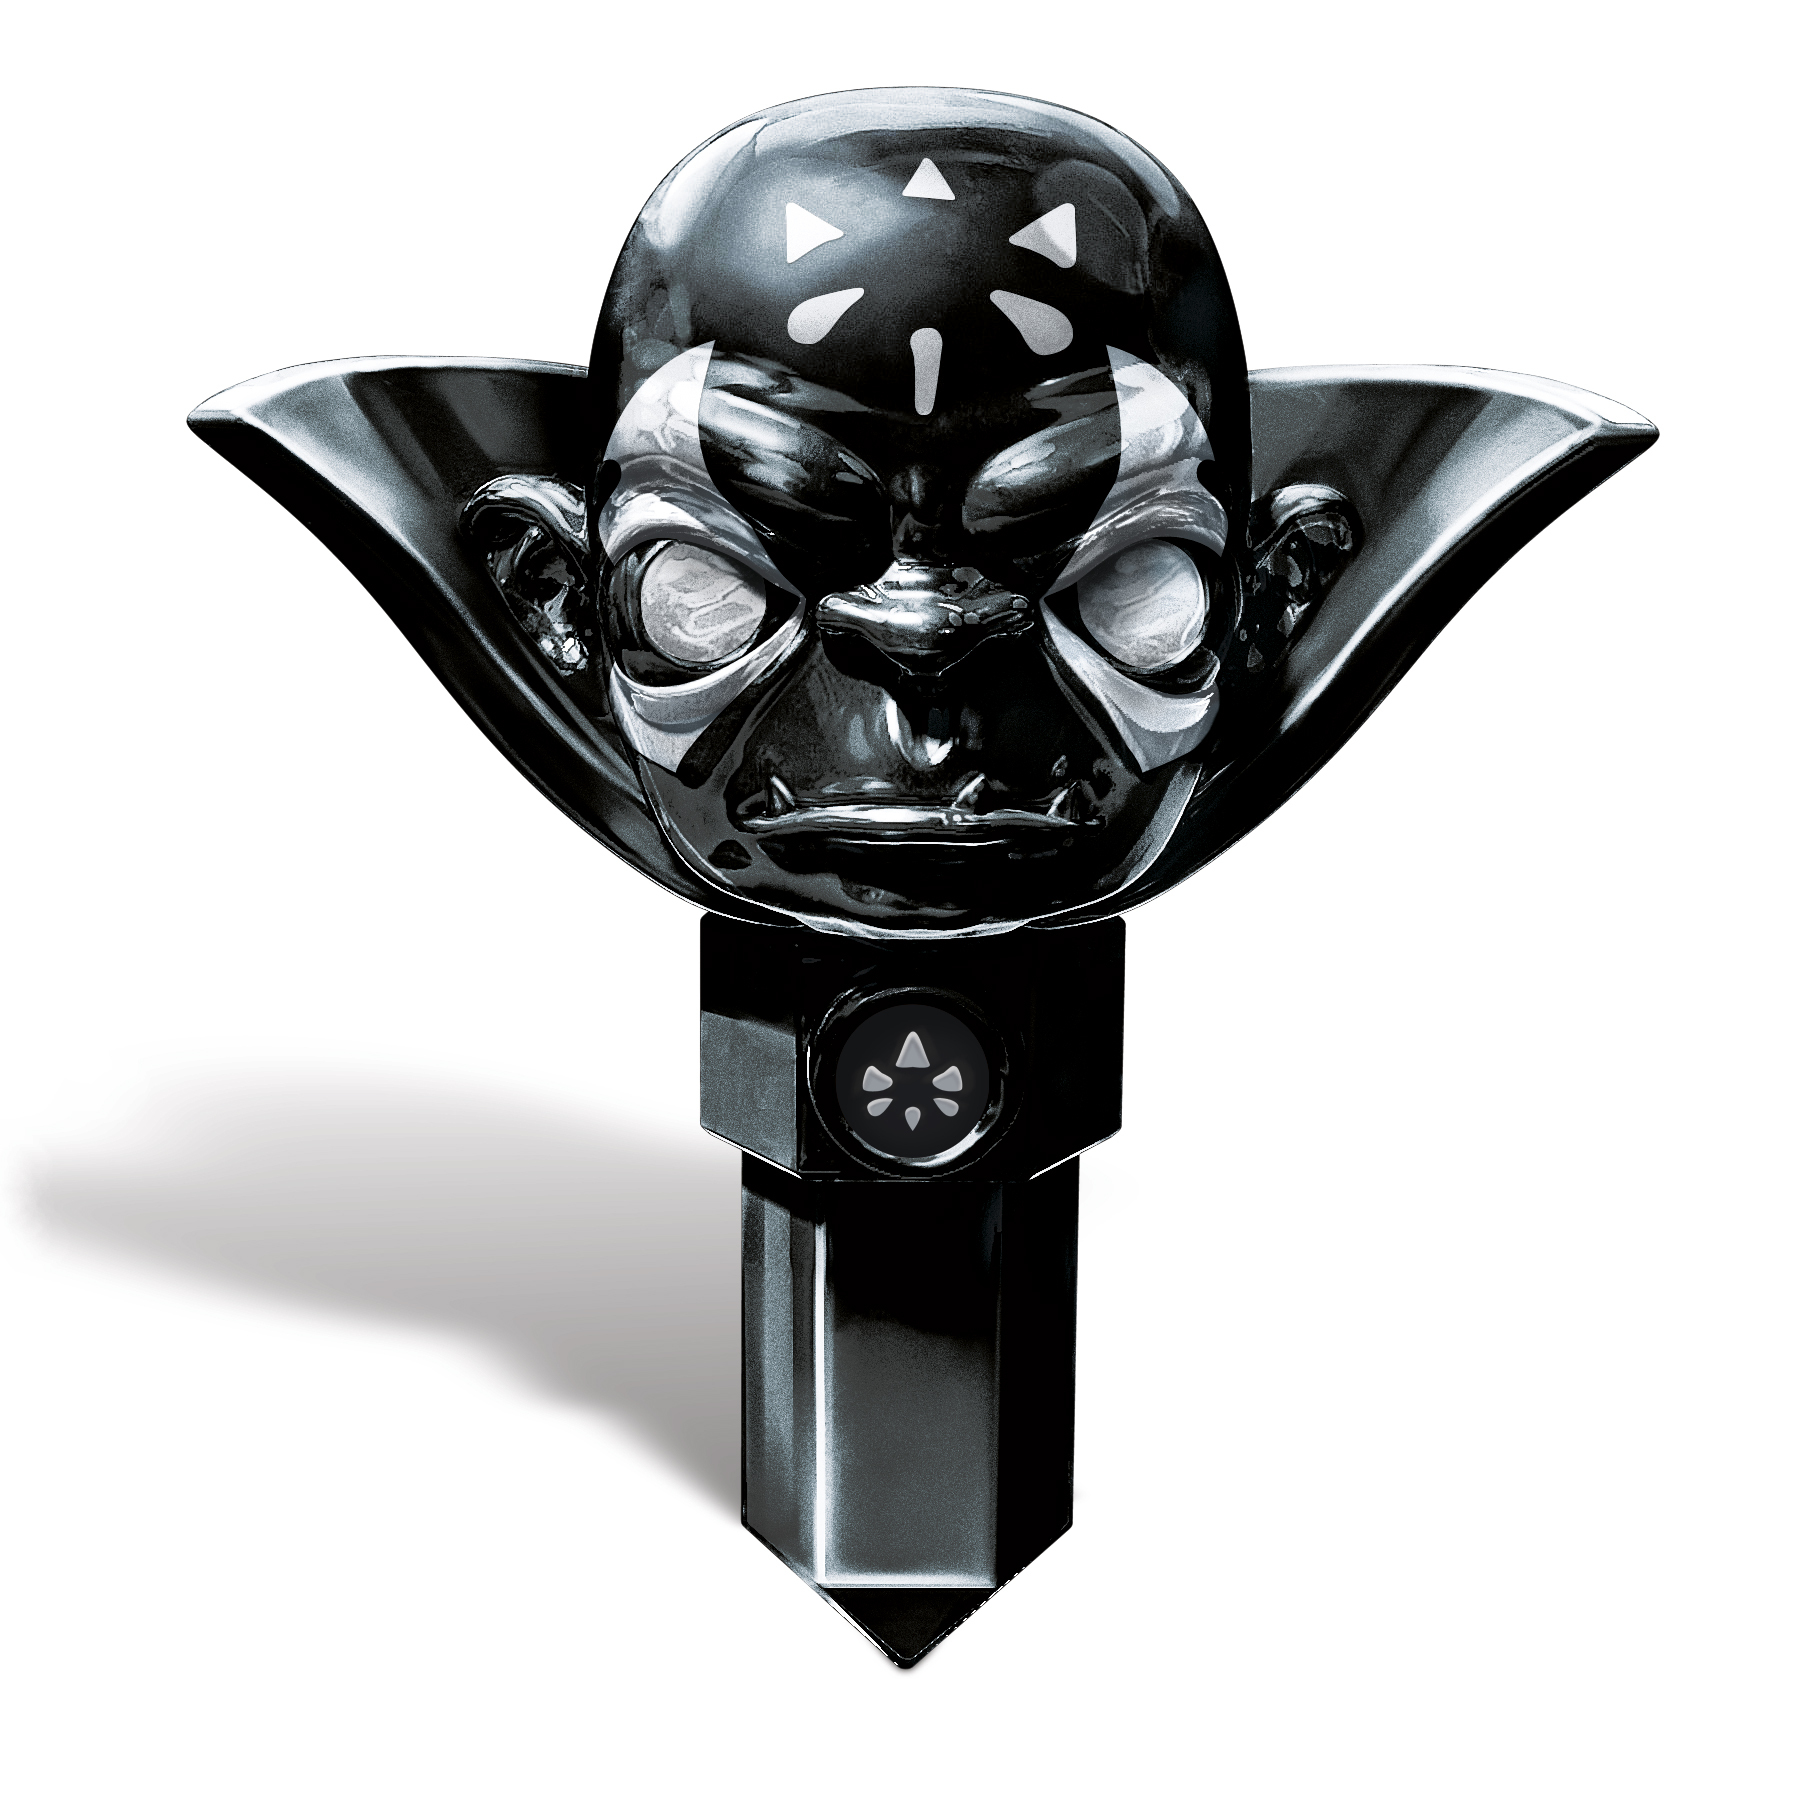 Skylanders Trap Team Dark Edition Ultimate Kaos Trap (Photo: Business Wire)